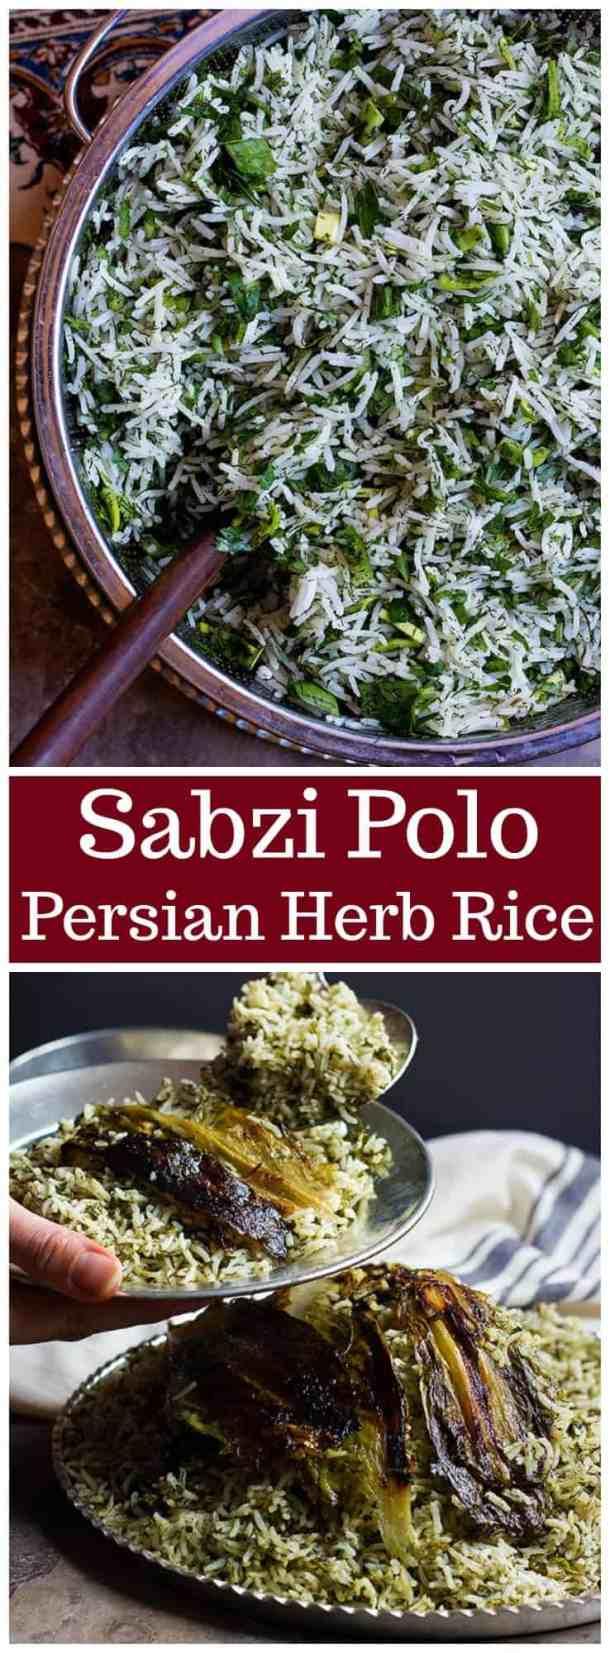 Sabzi polo persian herb rice unicorns in the kitchen sabzi polo sabzi polo recipe herb rice recipe herb rice persian rice forumfinder Images